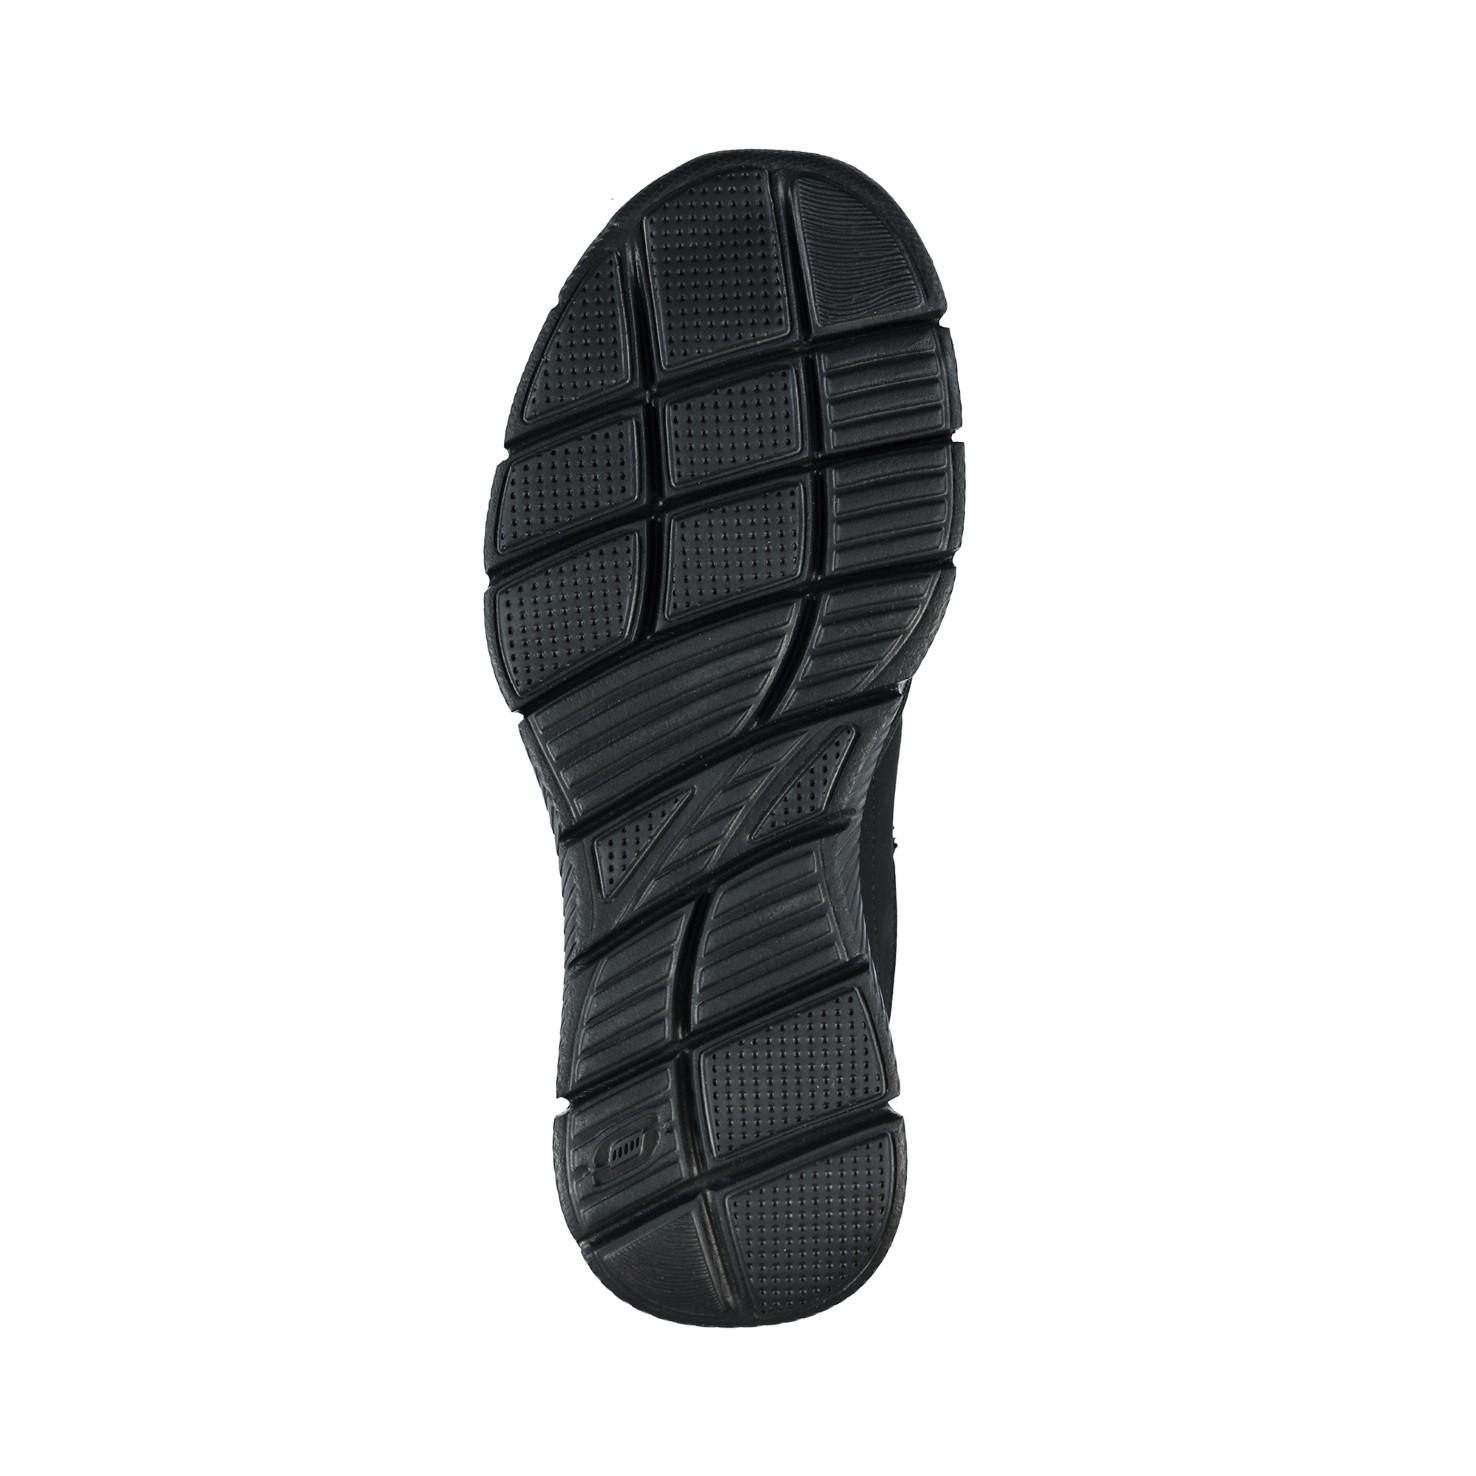 Skechers Equalizer-Persistent Erkek Siyah Spor Ayakkabı